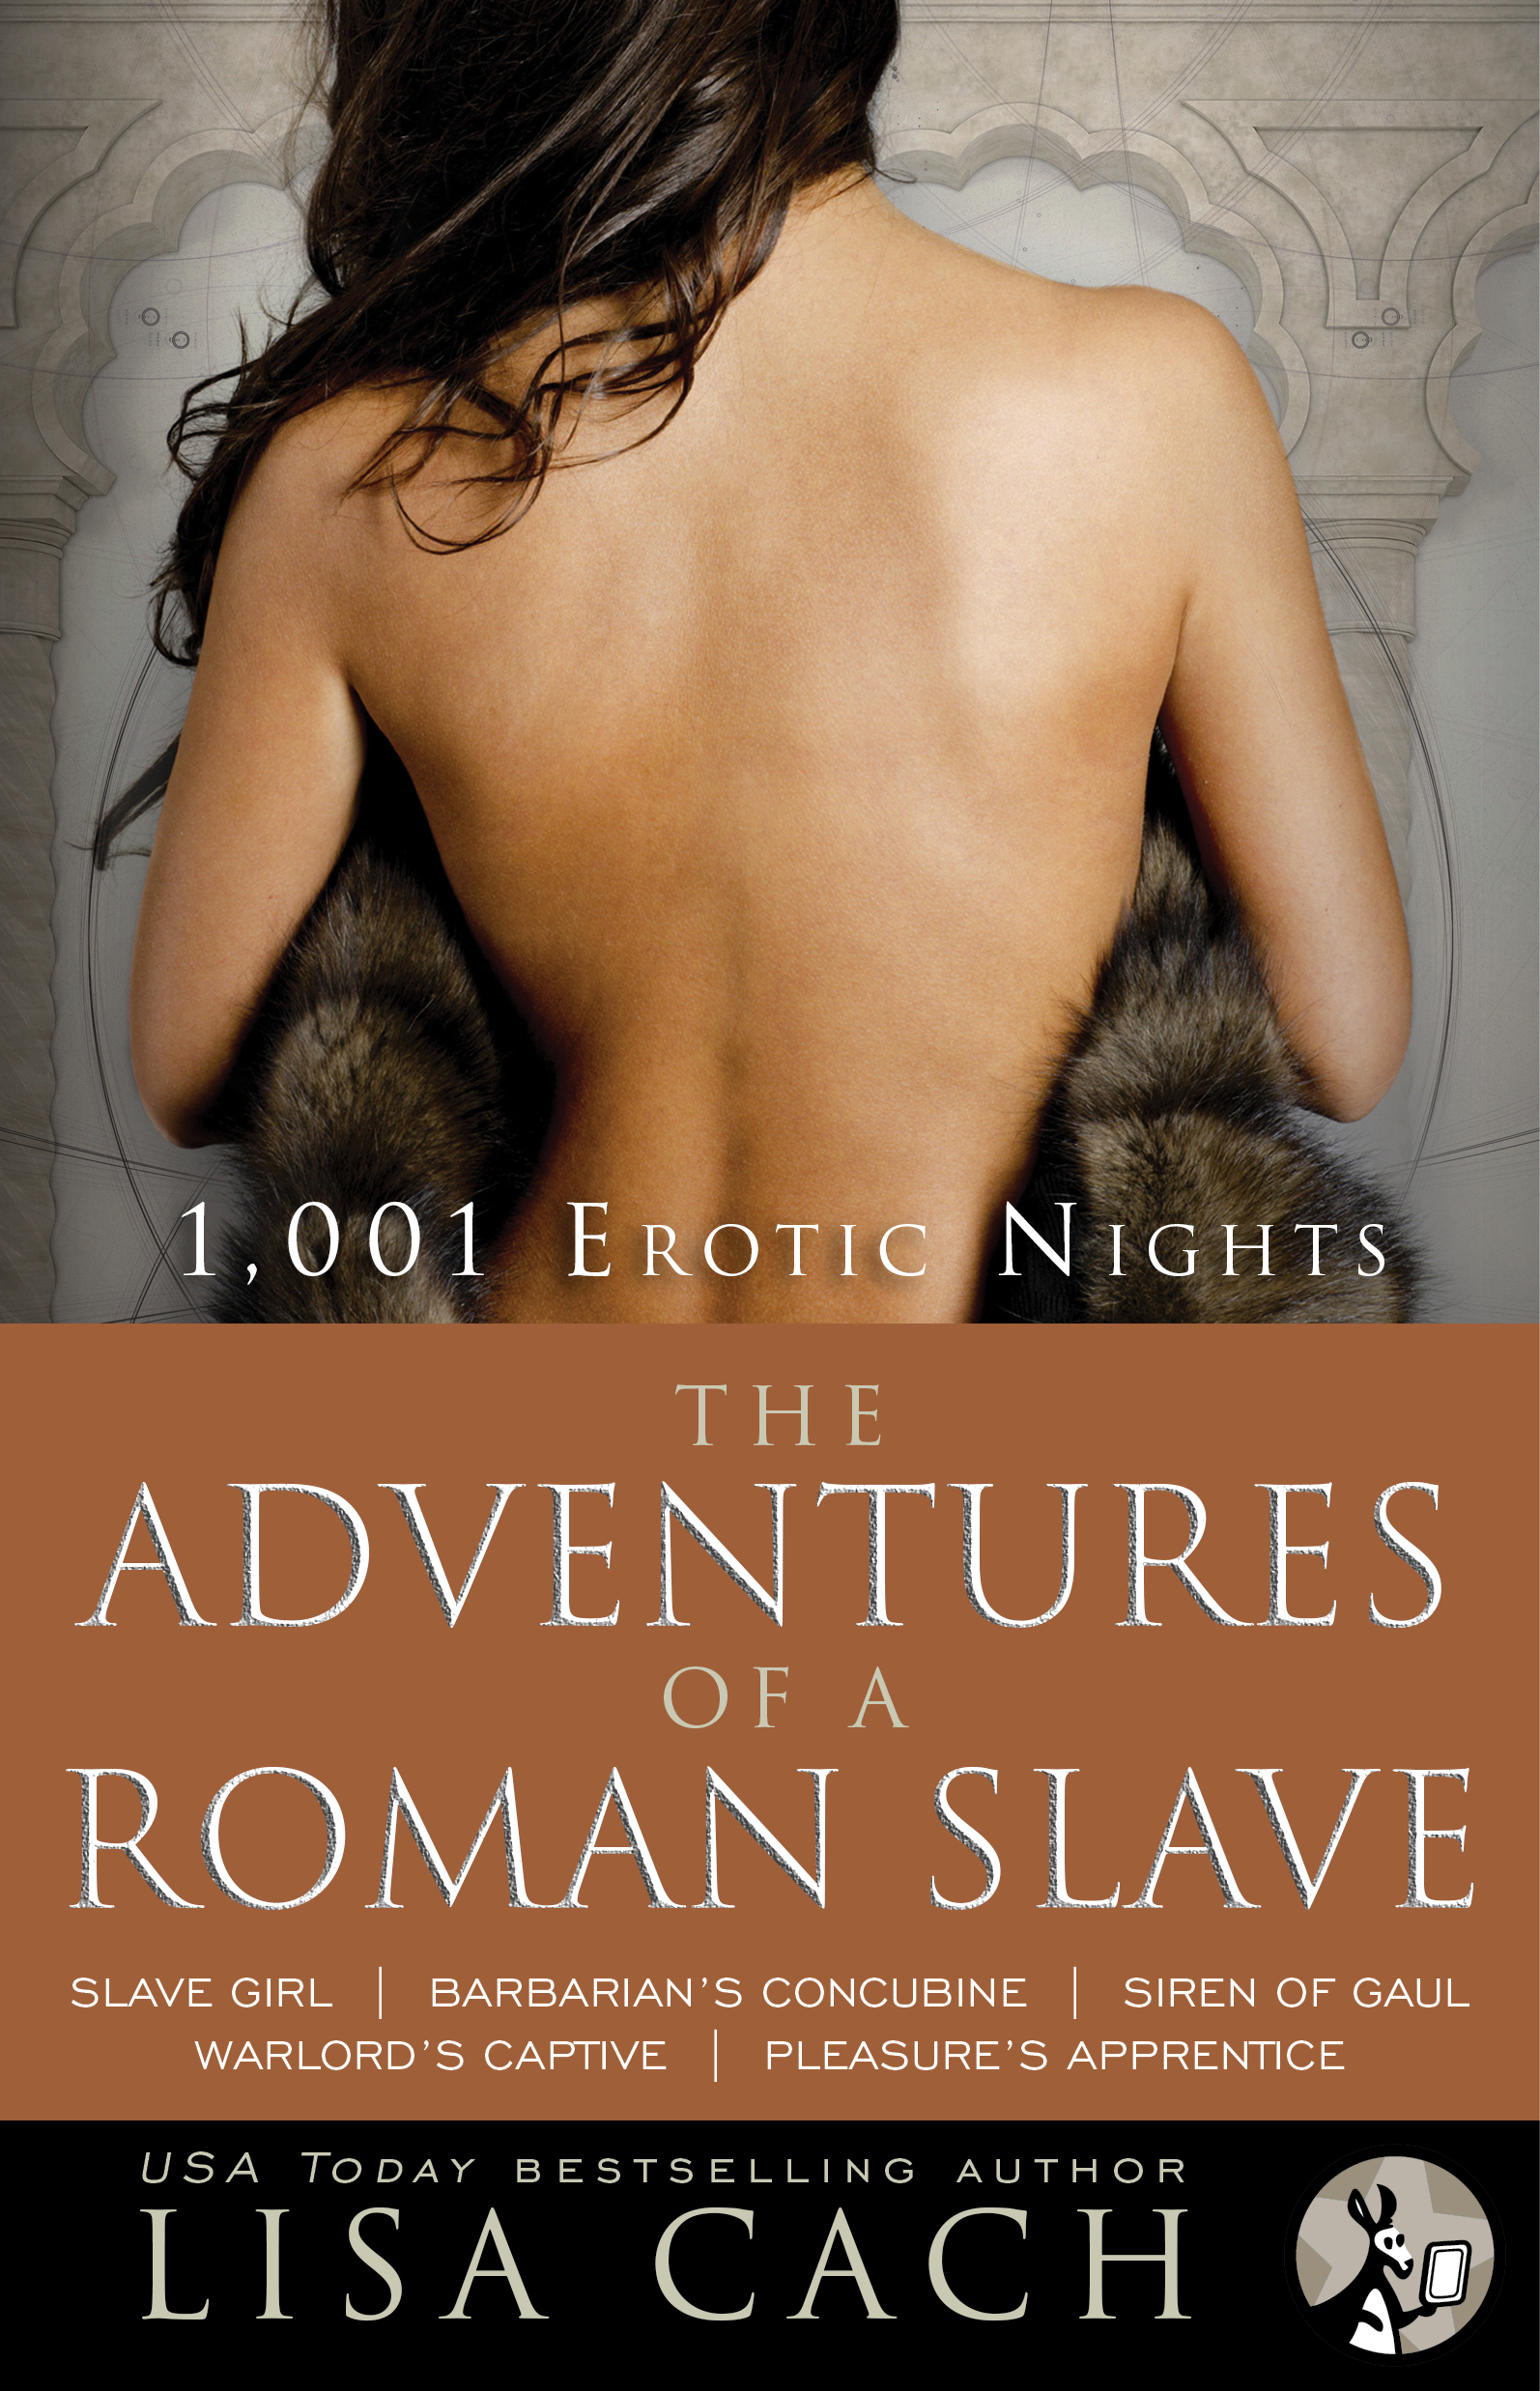 Someone 1001 erotic nights torrent apologise